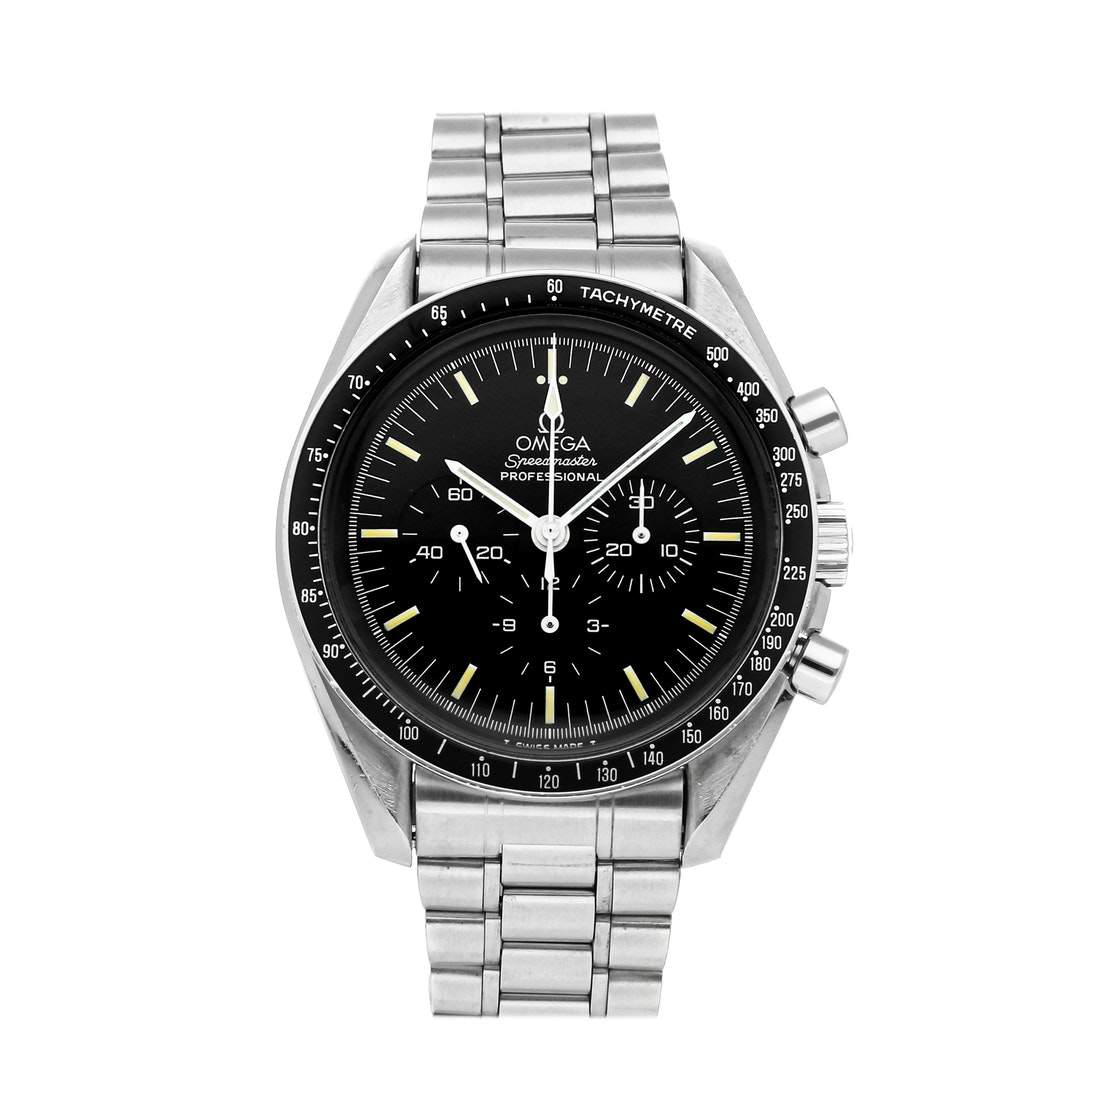 Omega Black Stainless Steel Speedmaster Moonwatch 145.022 Men's Wristwatch 42 MM